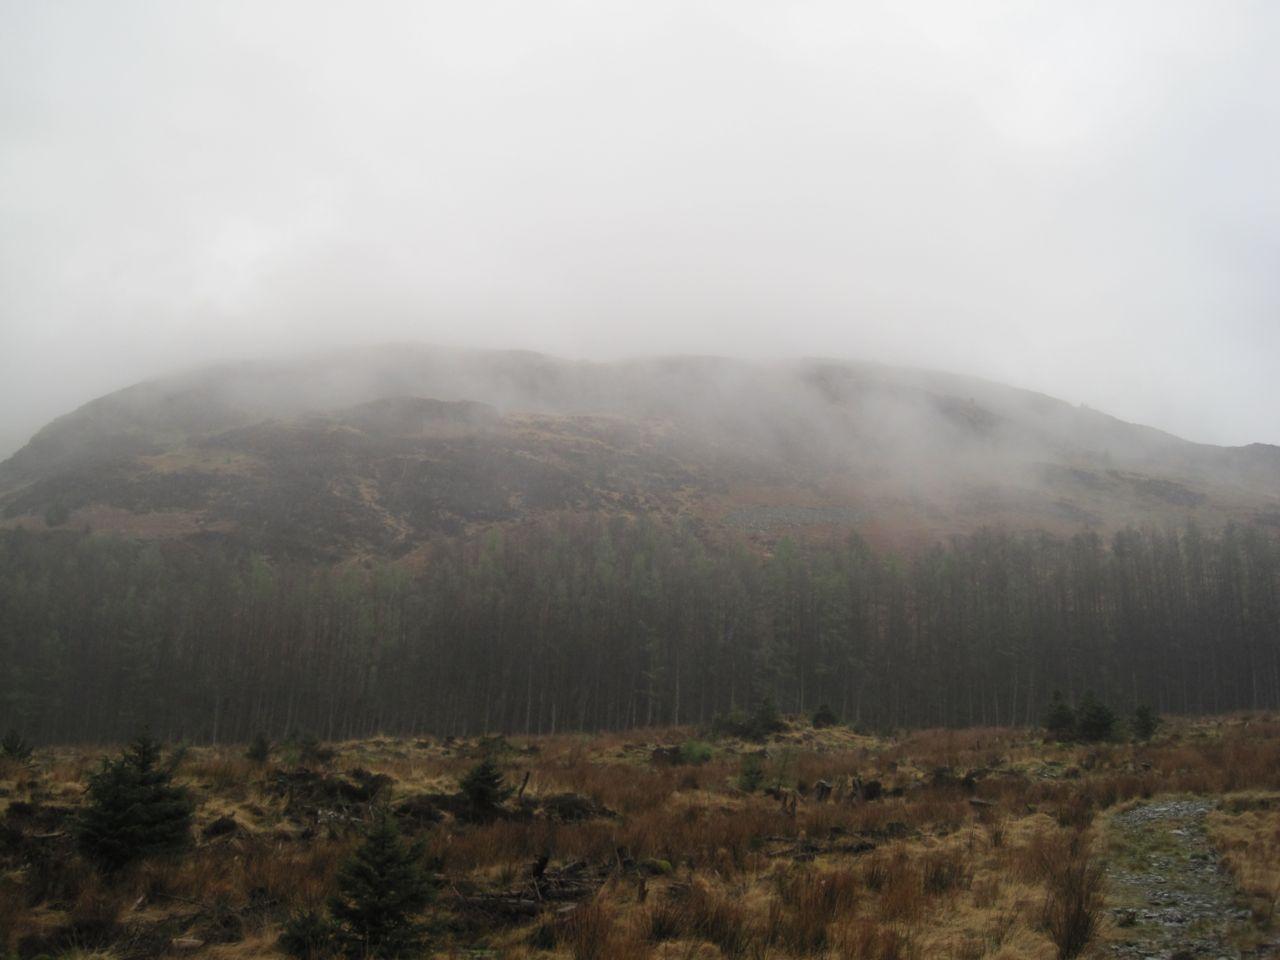 Low Craignell, gravel path